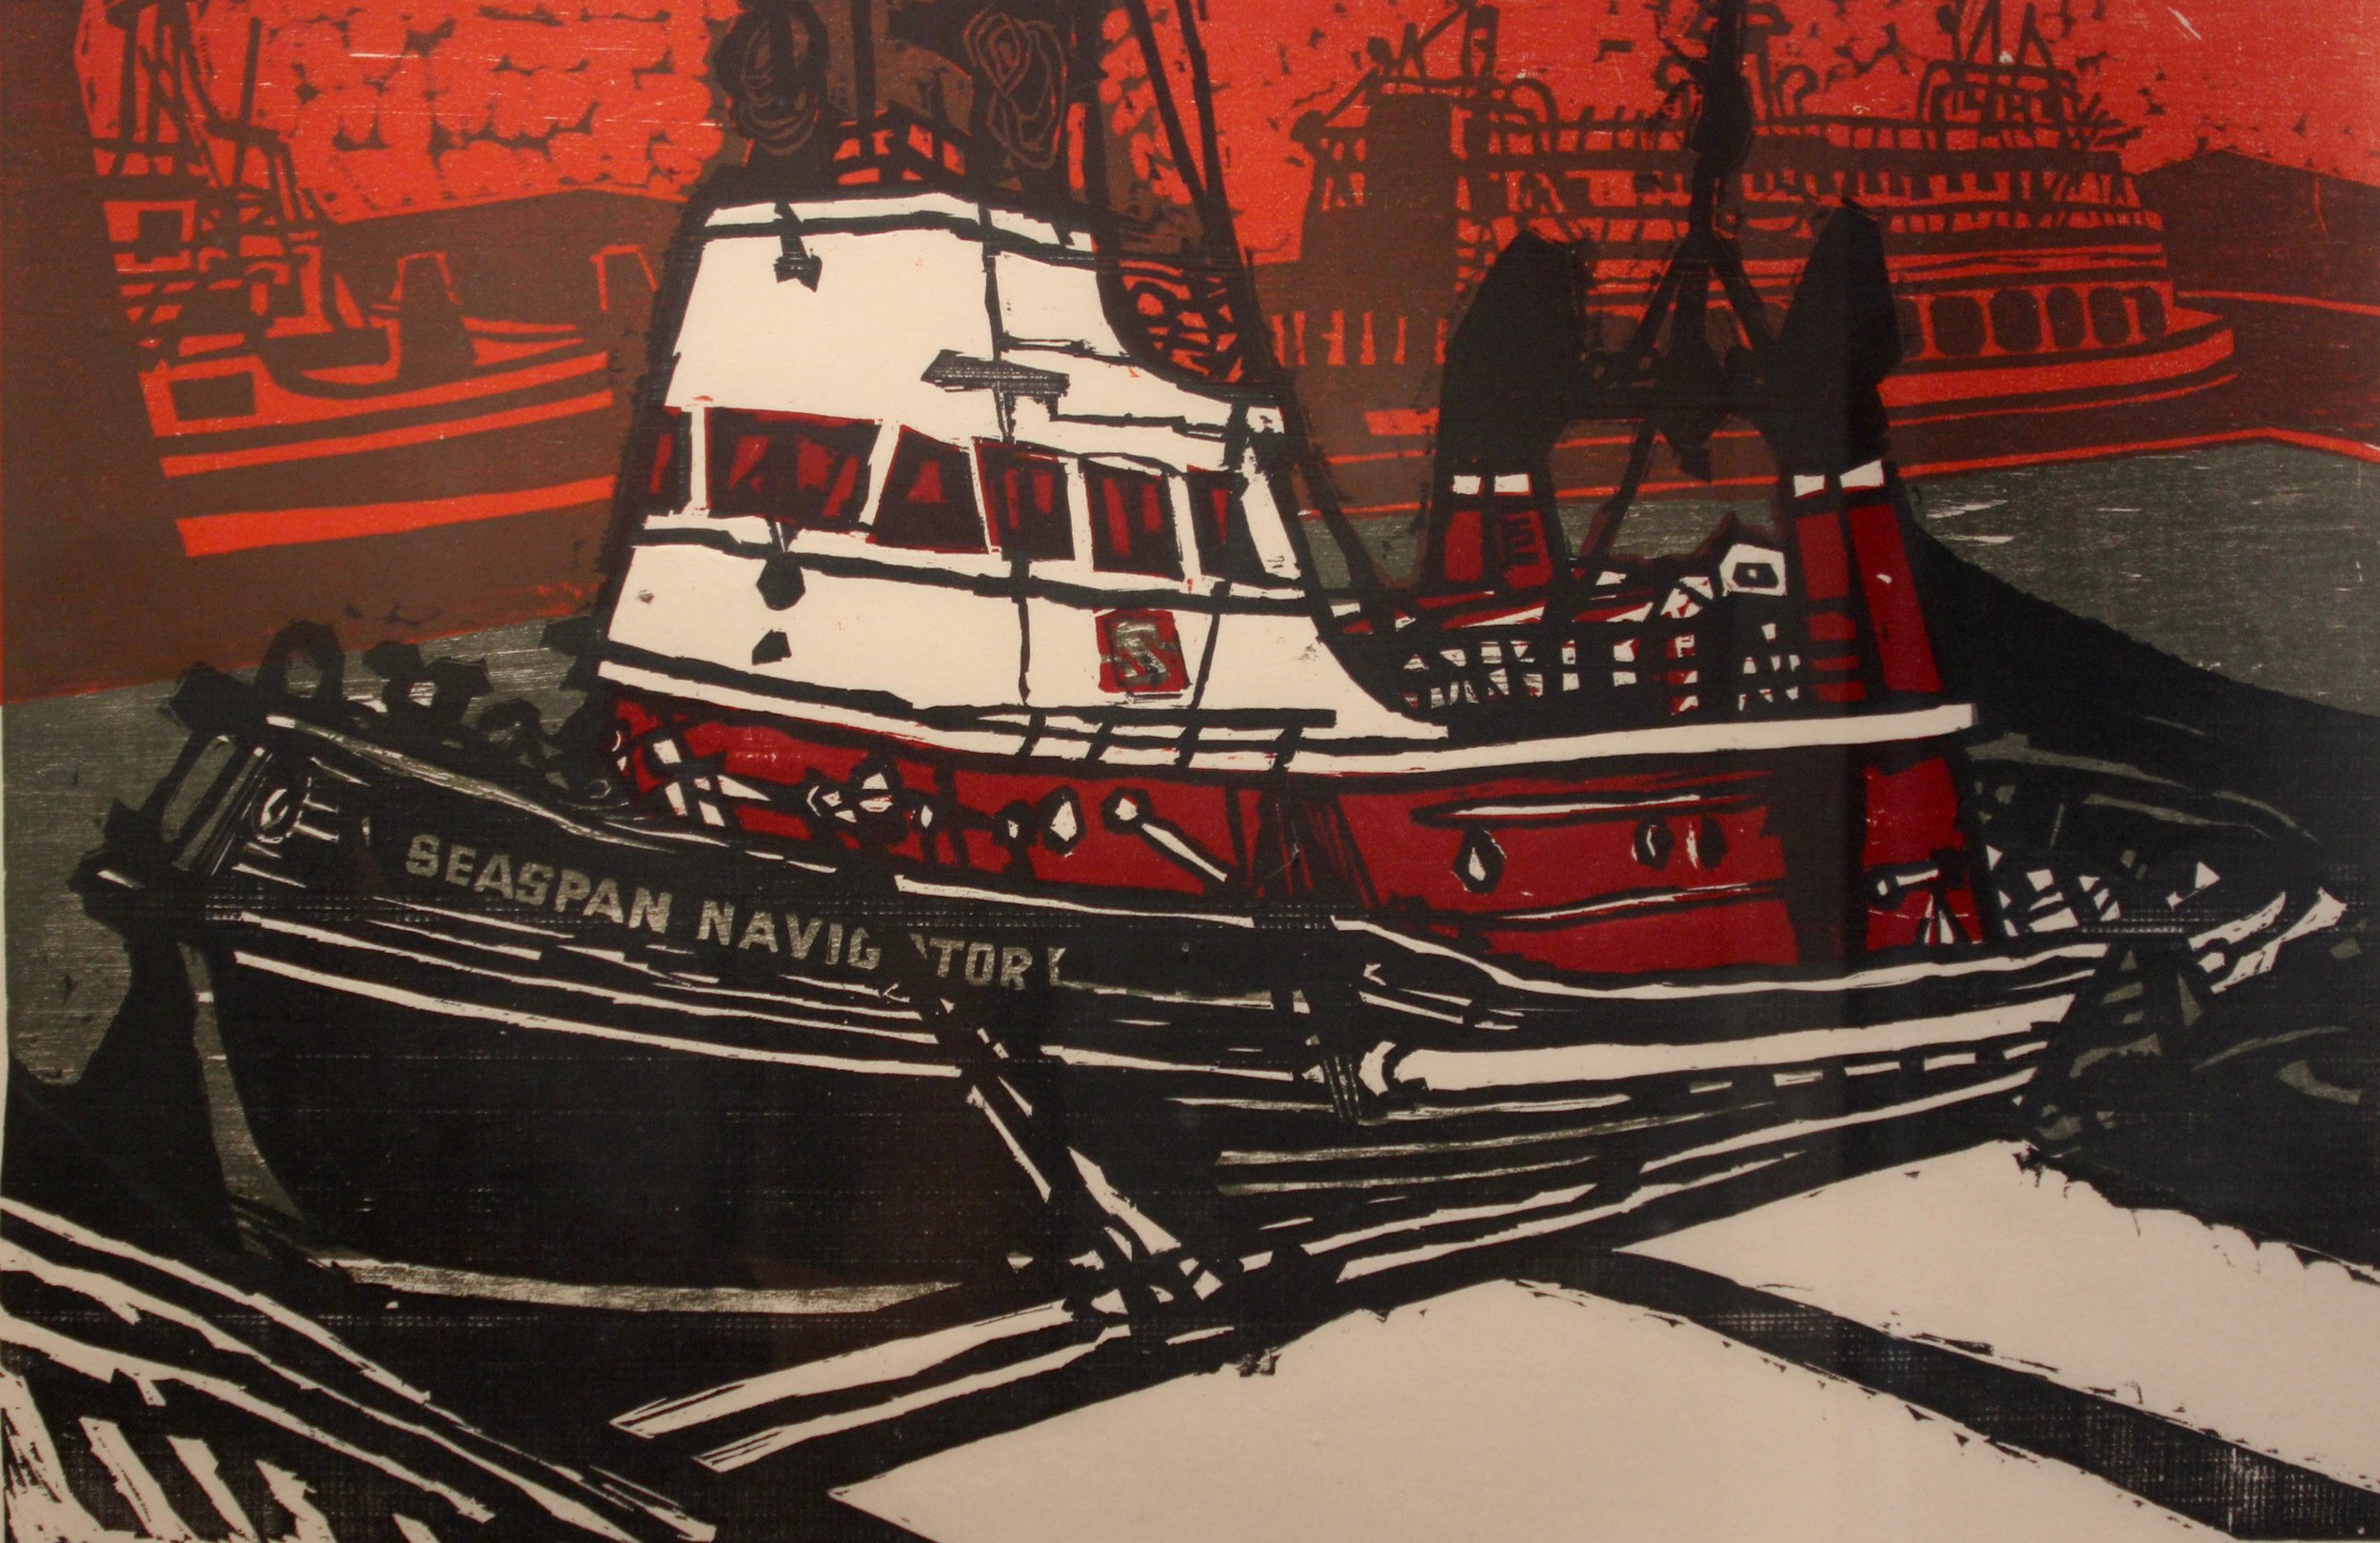 Alistair Macready Bell, North Shore Tugboat